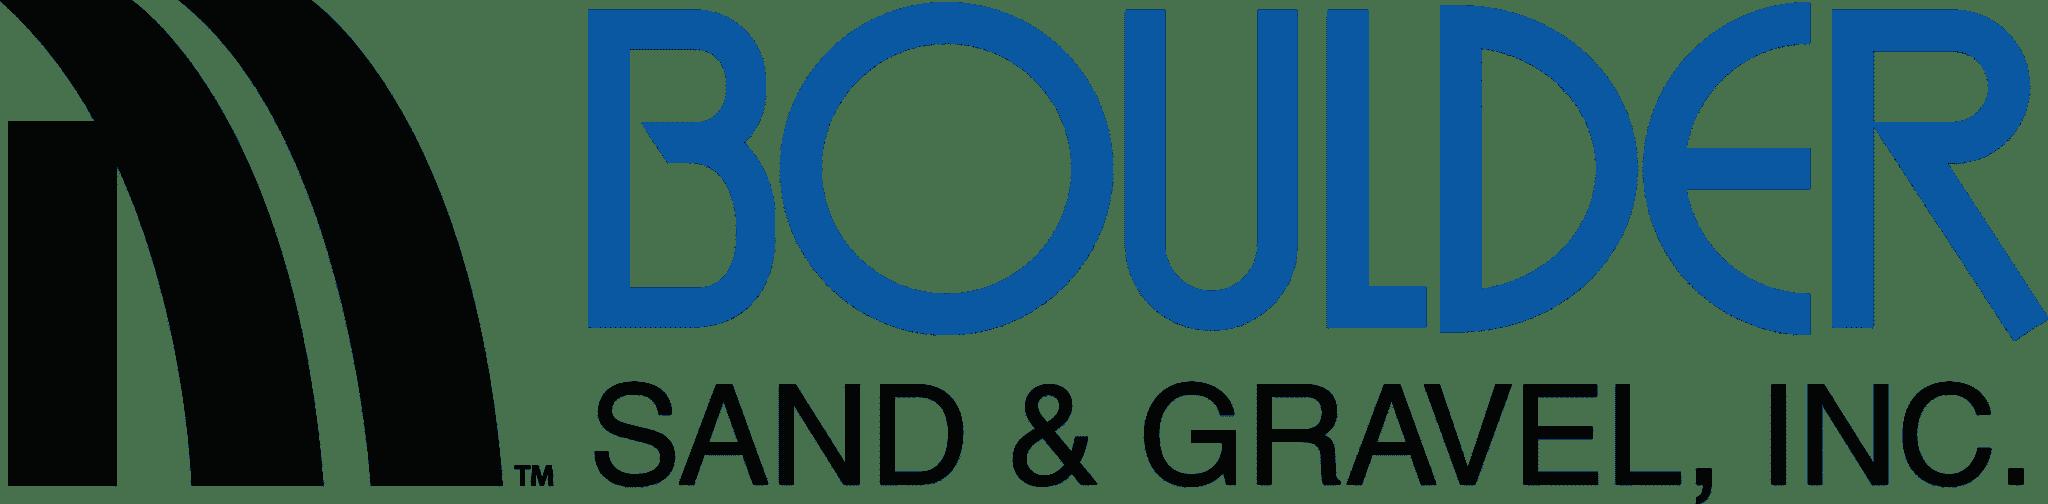 Boulder Sand And Gravel